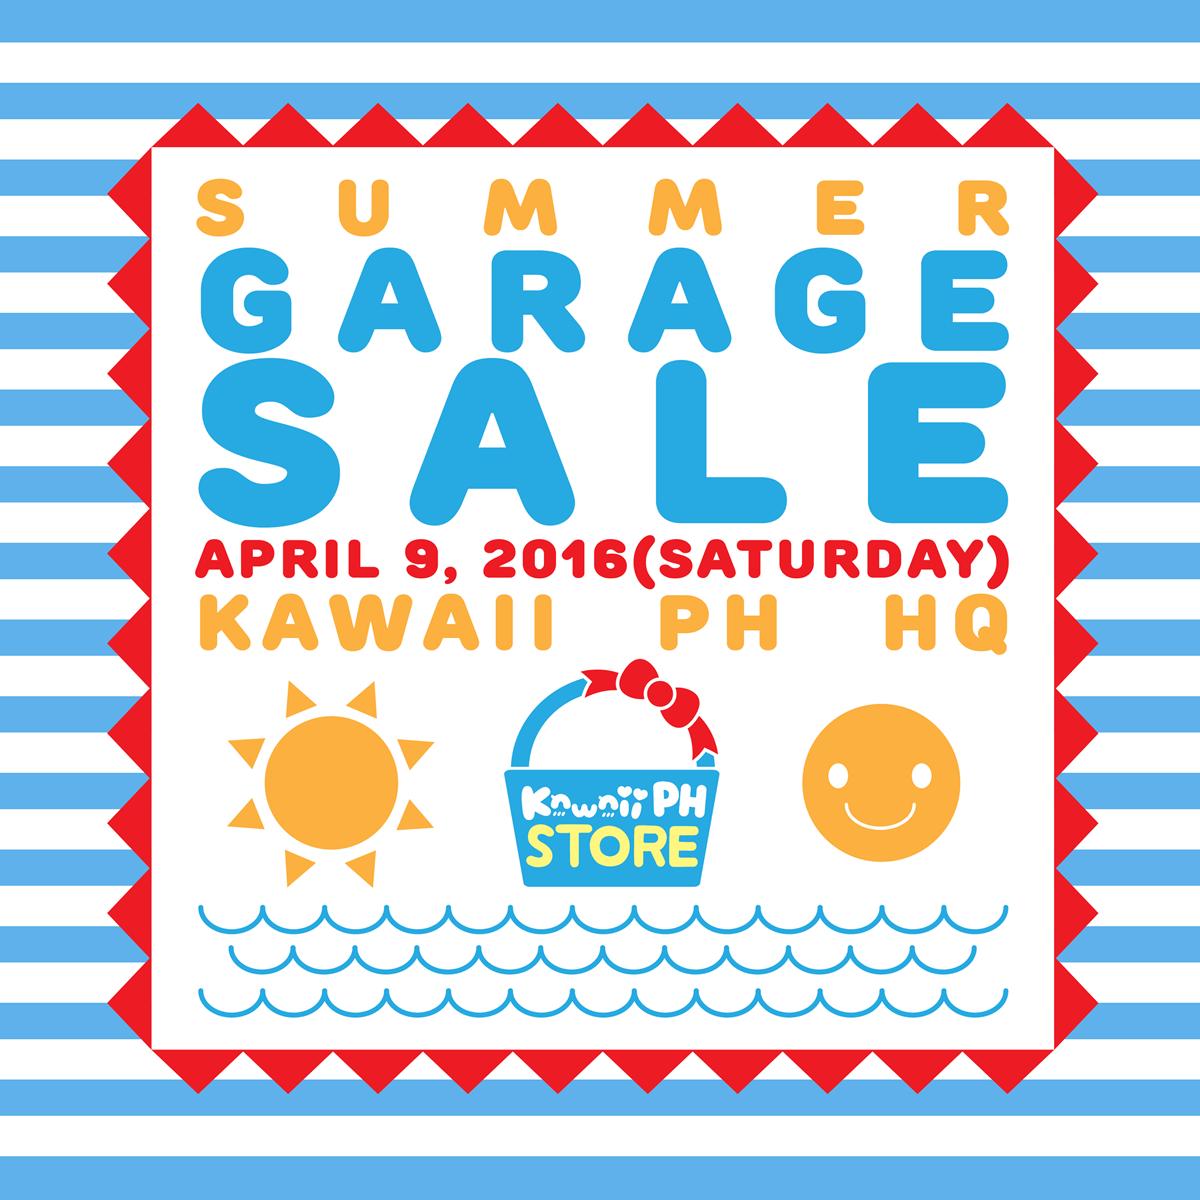 Kawaii PH Store Summer Garage Sale